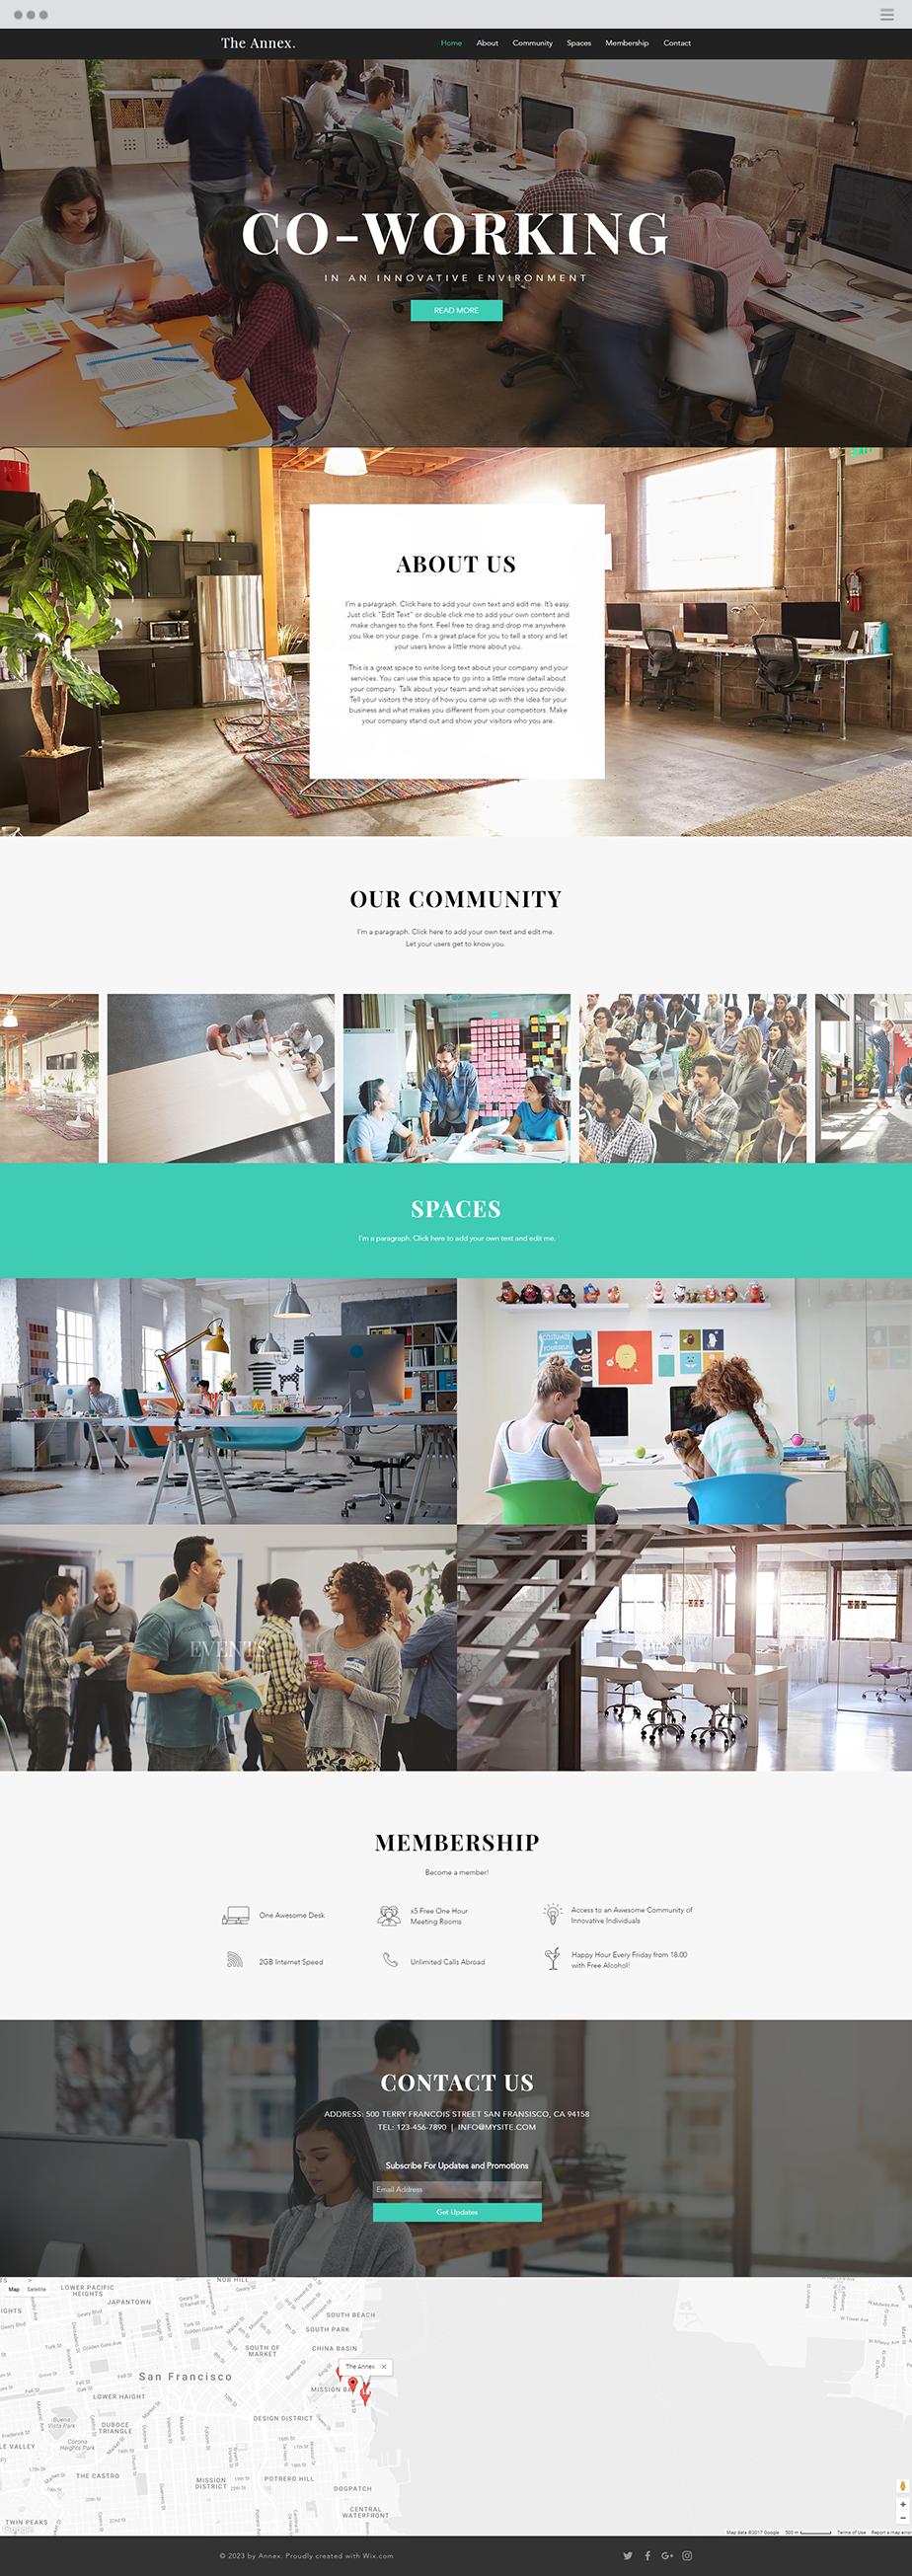 print shop wix website templates pinterest shops templates